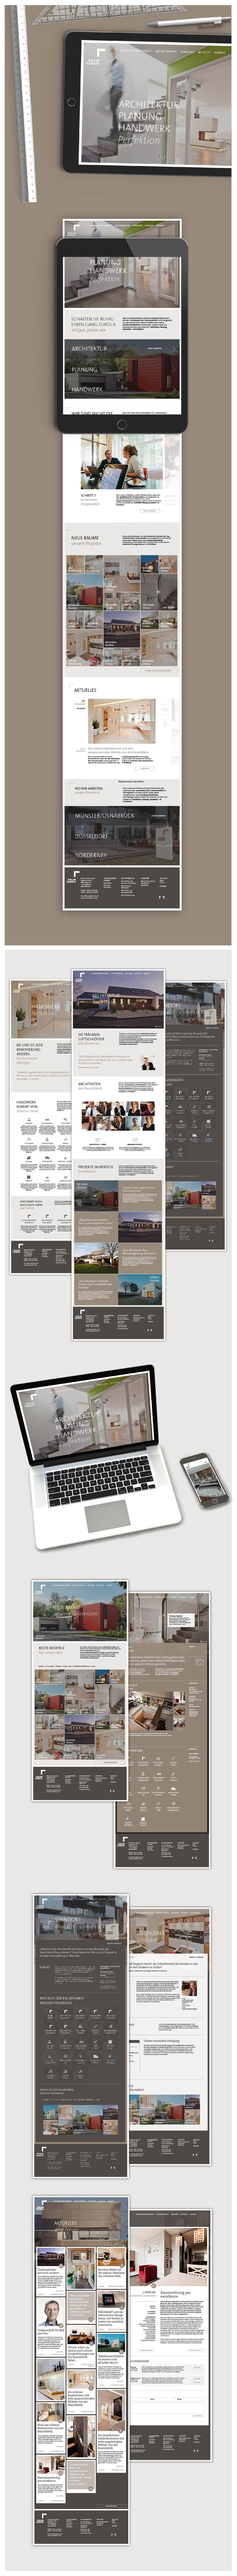 Raumfabrik Internetseite